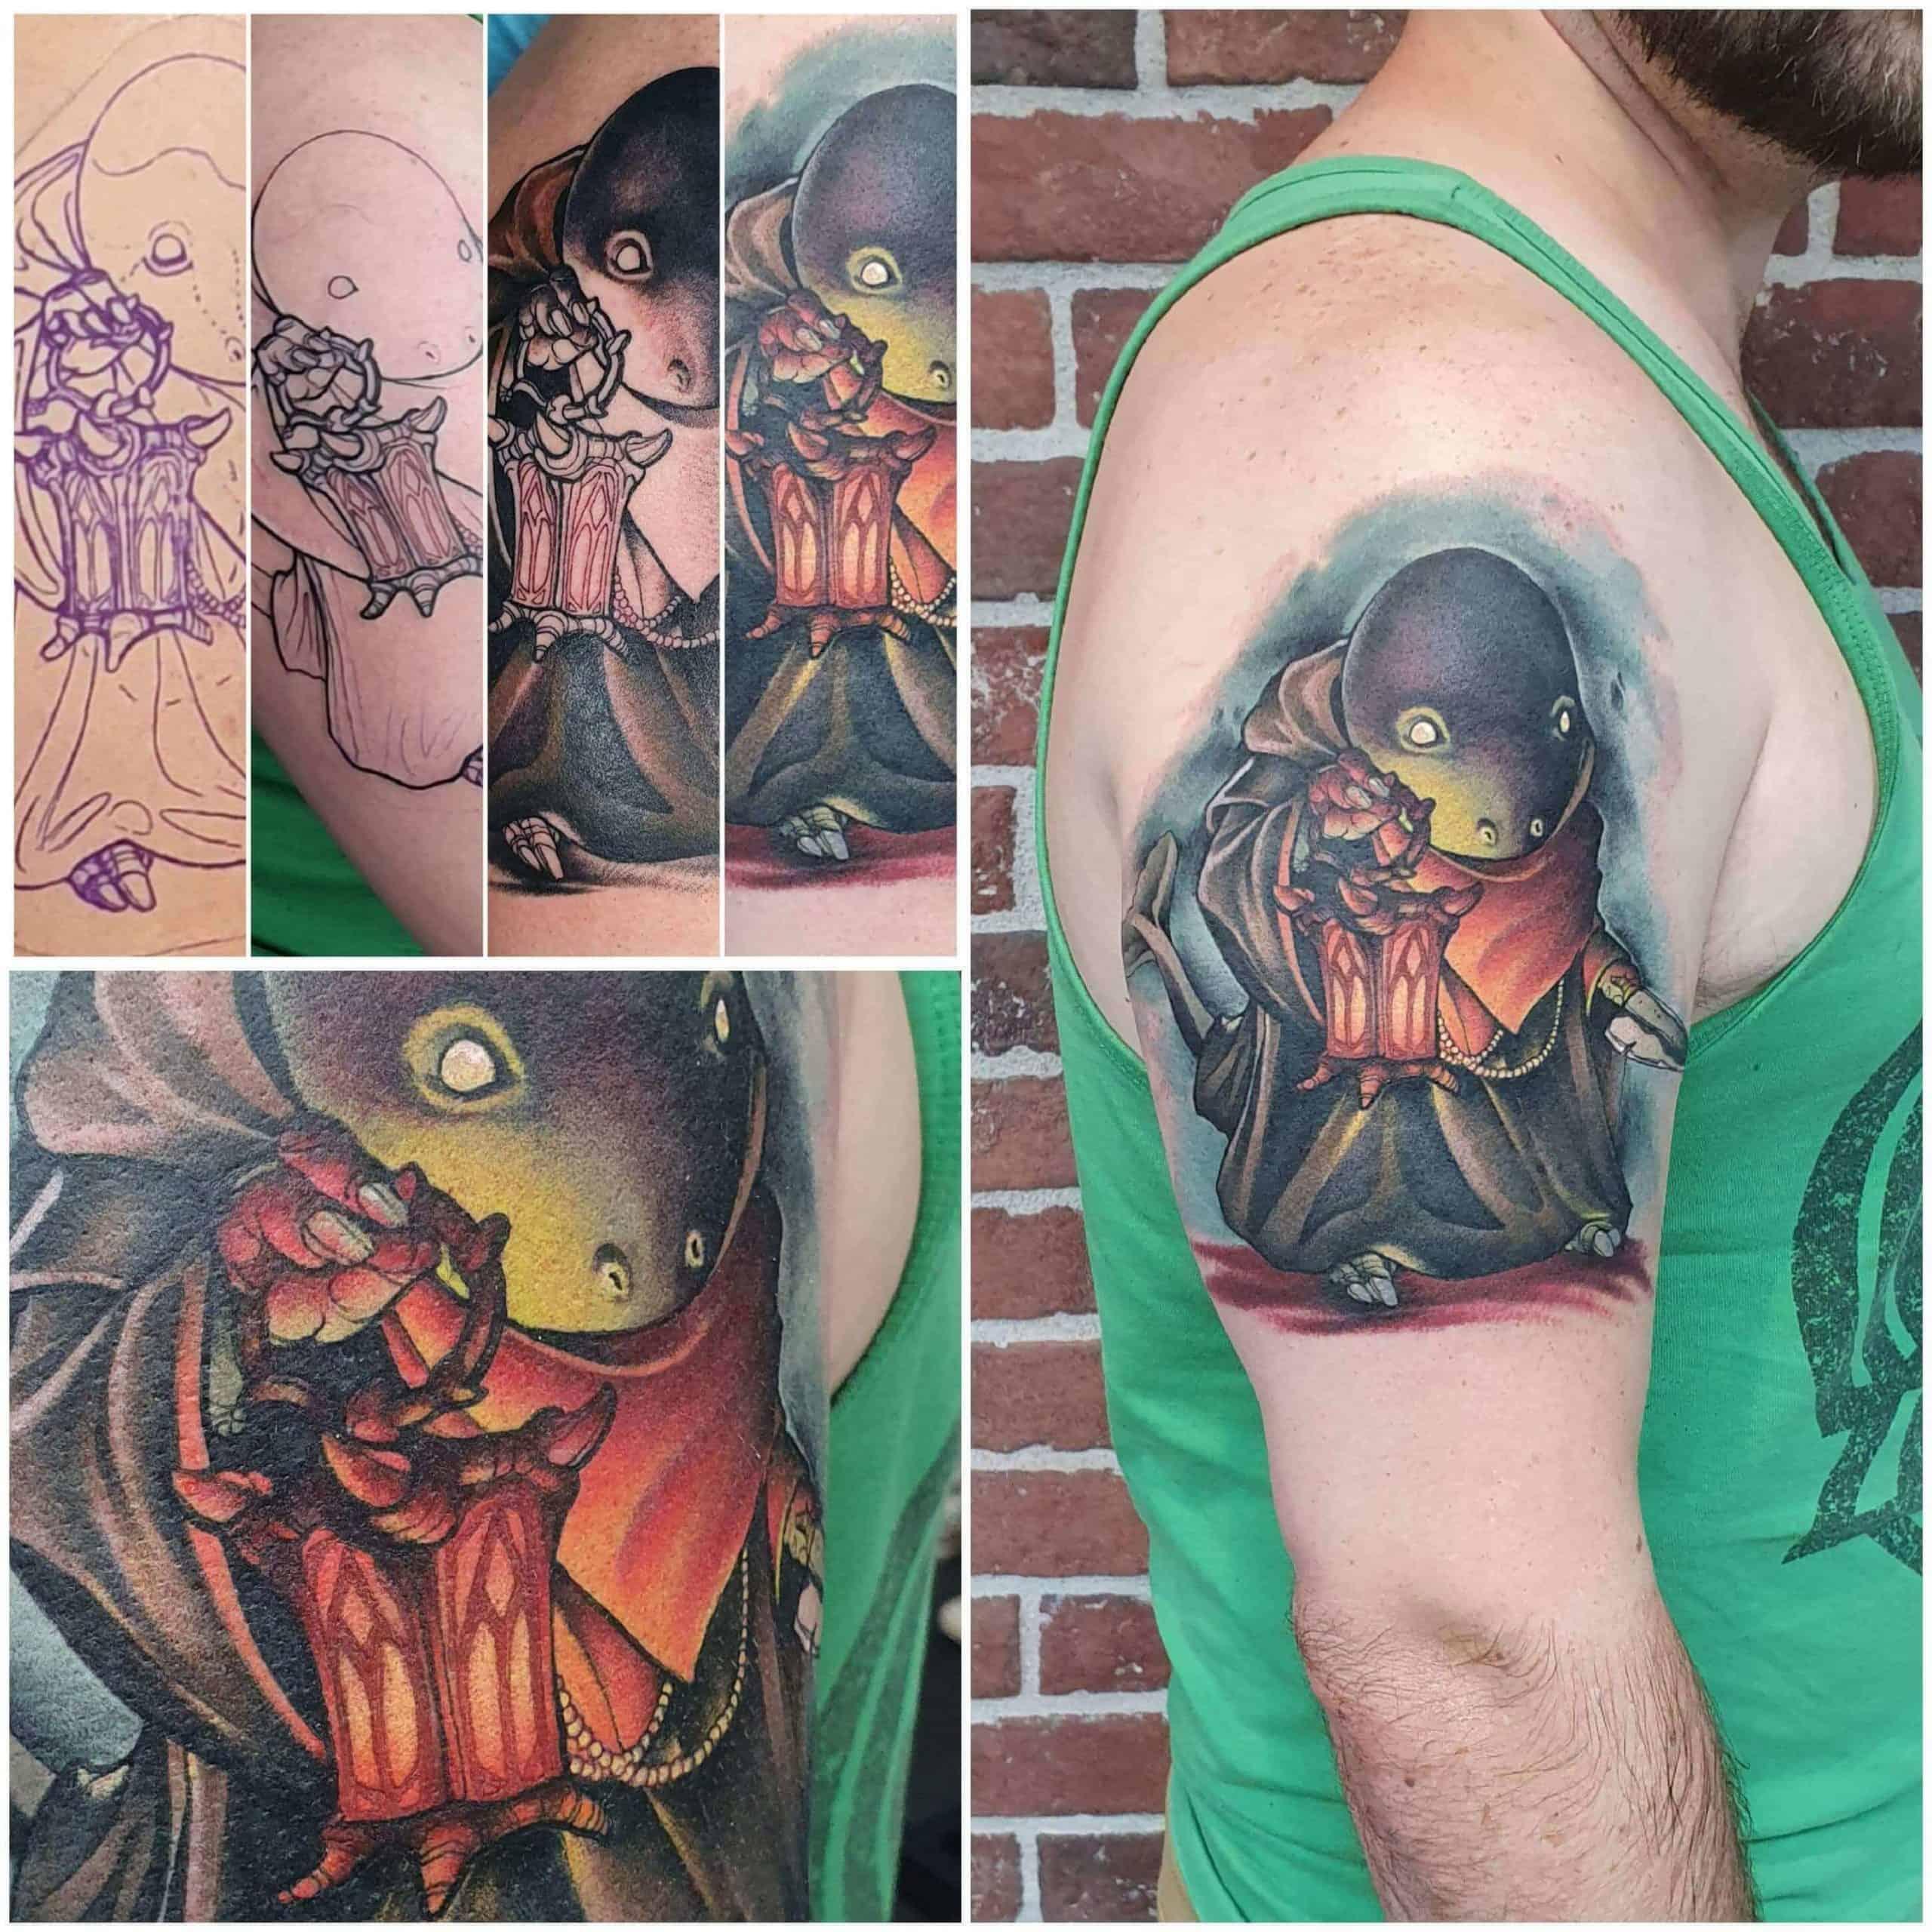 tonberry tattoo on arm